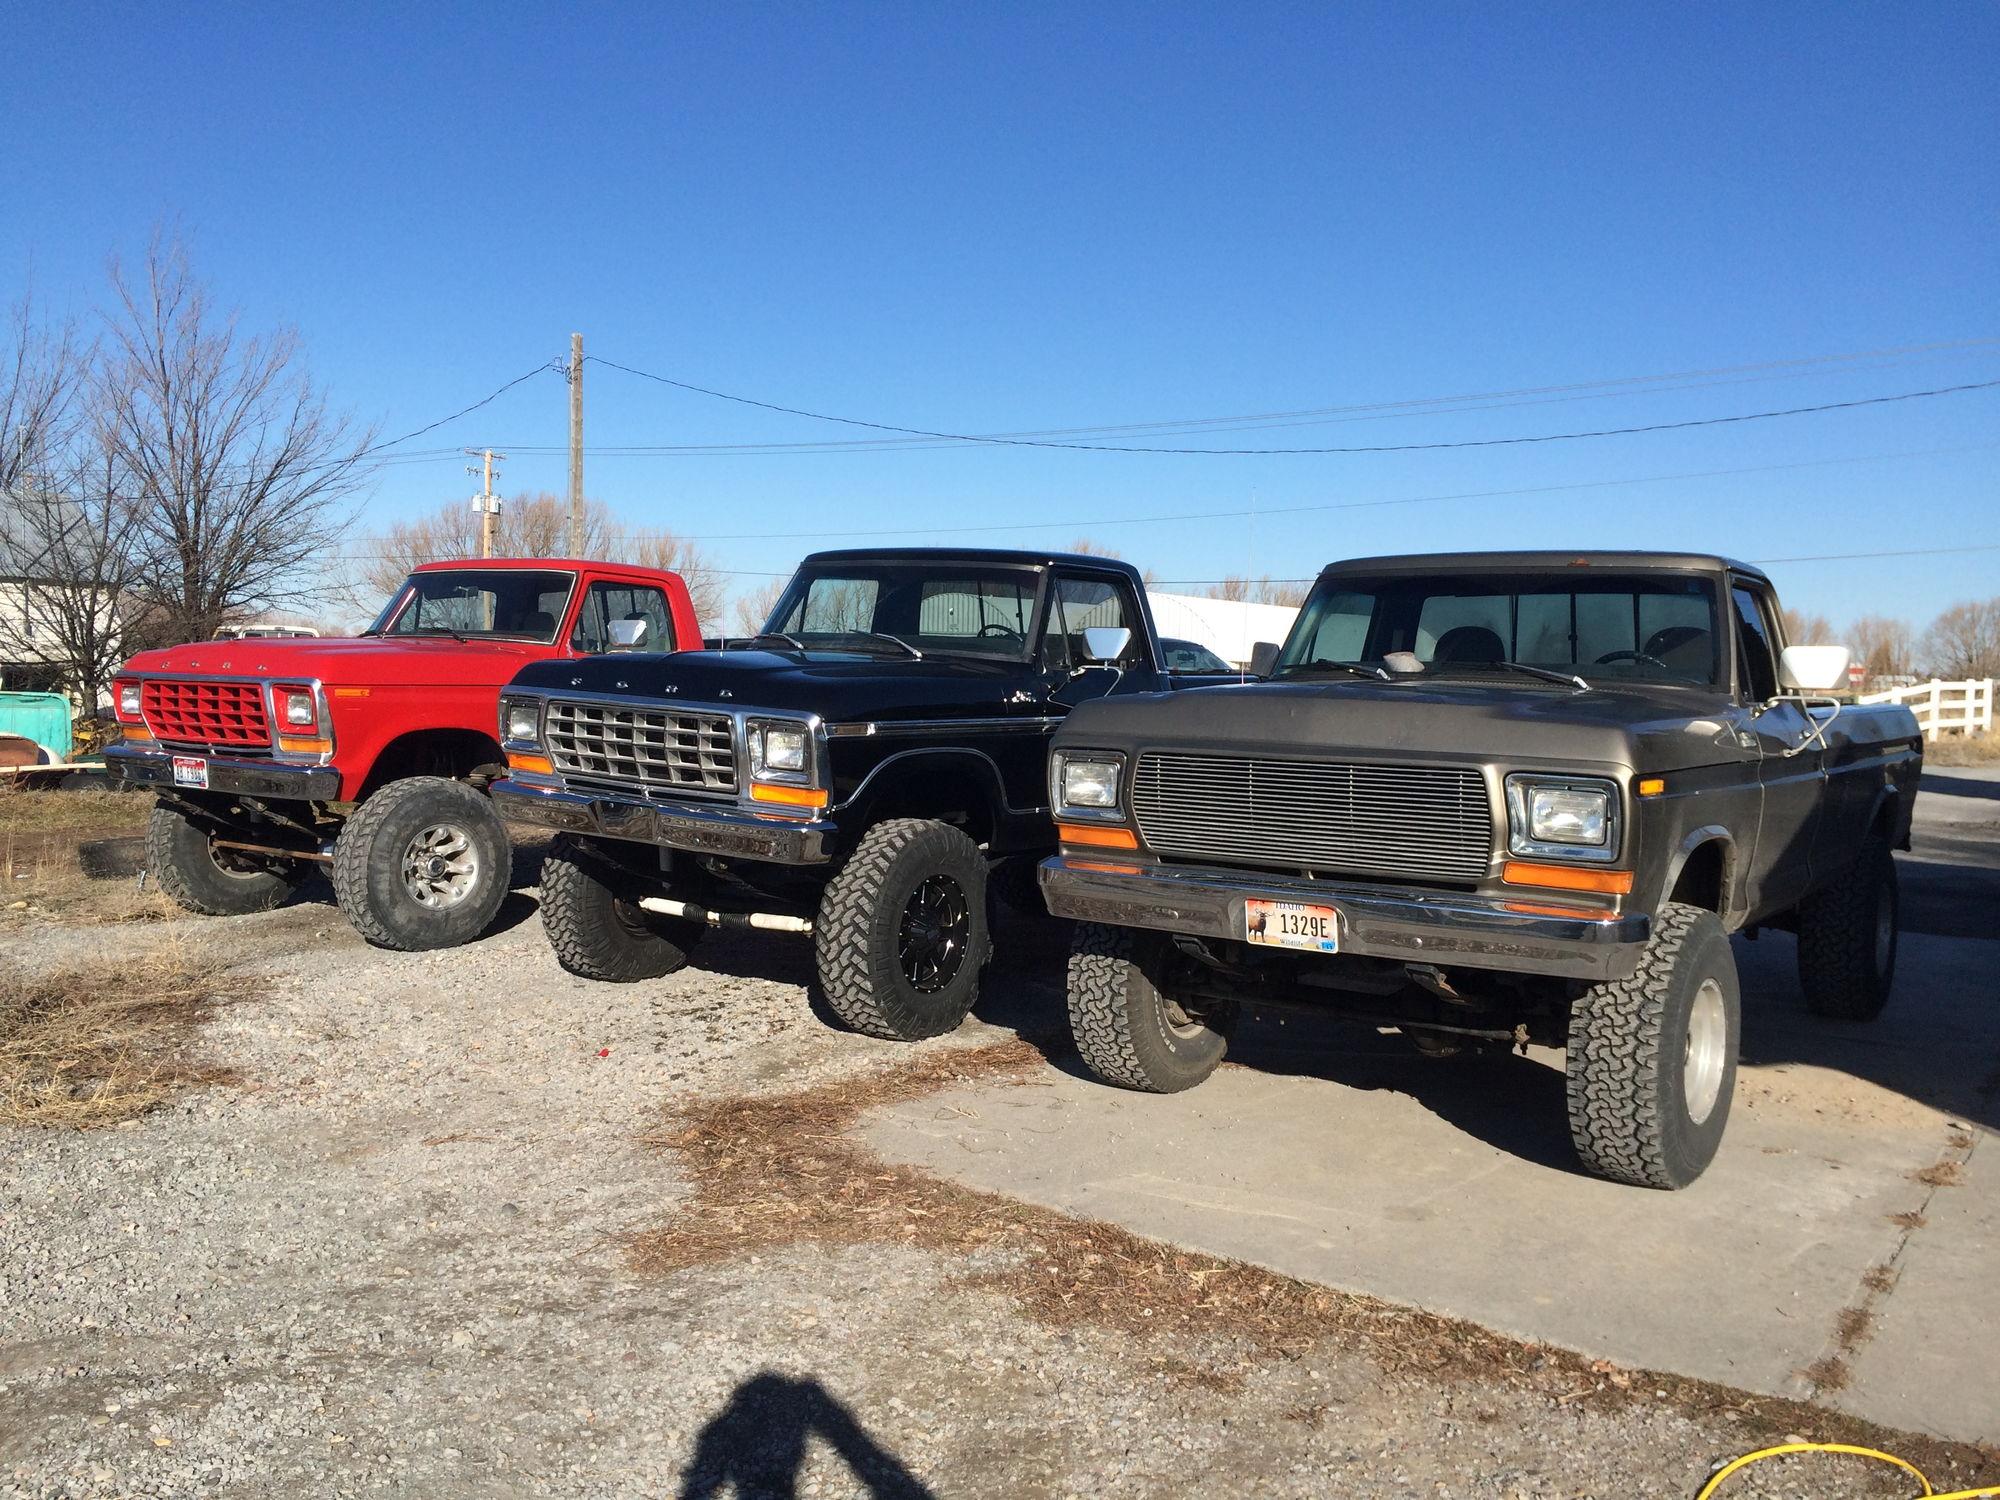 1973 f 350 crew cab 557 red and black build status in progress 1979 f 250 460 black build status finished 1979 f 250 400 arizona